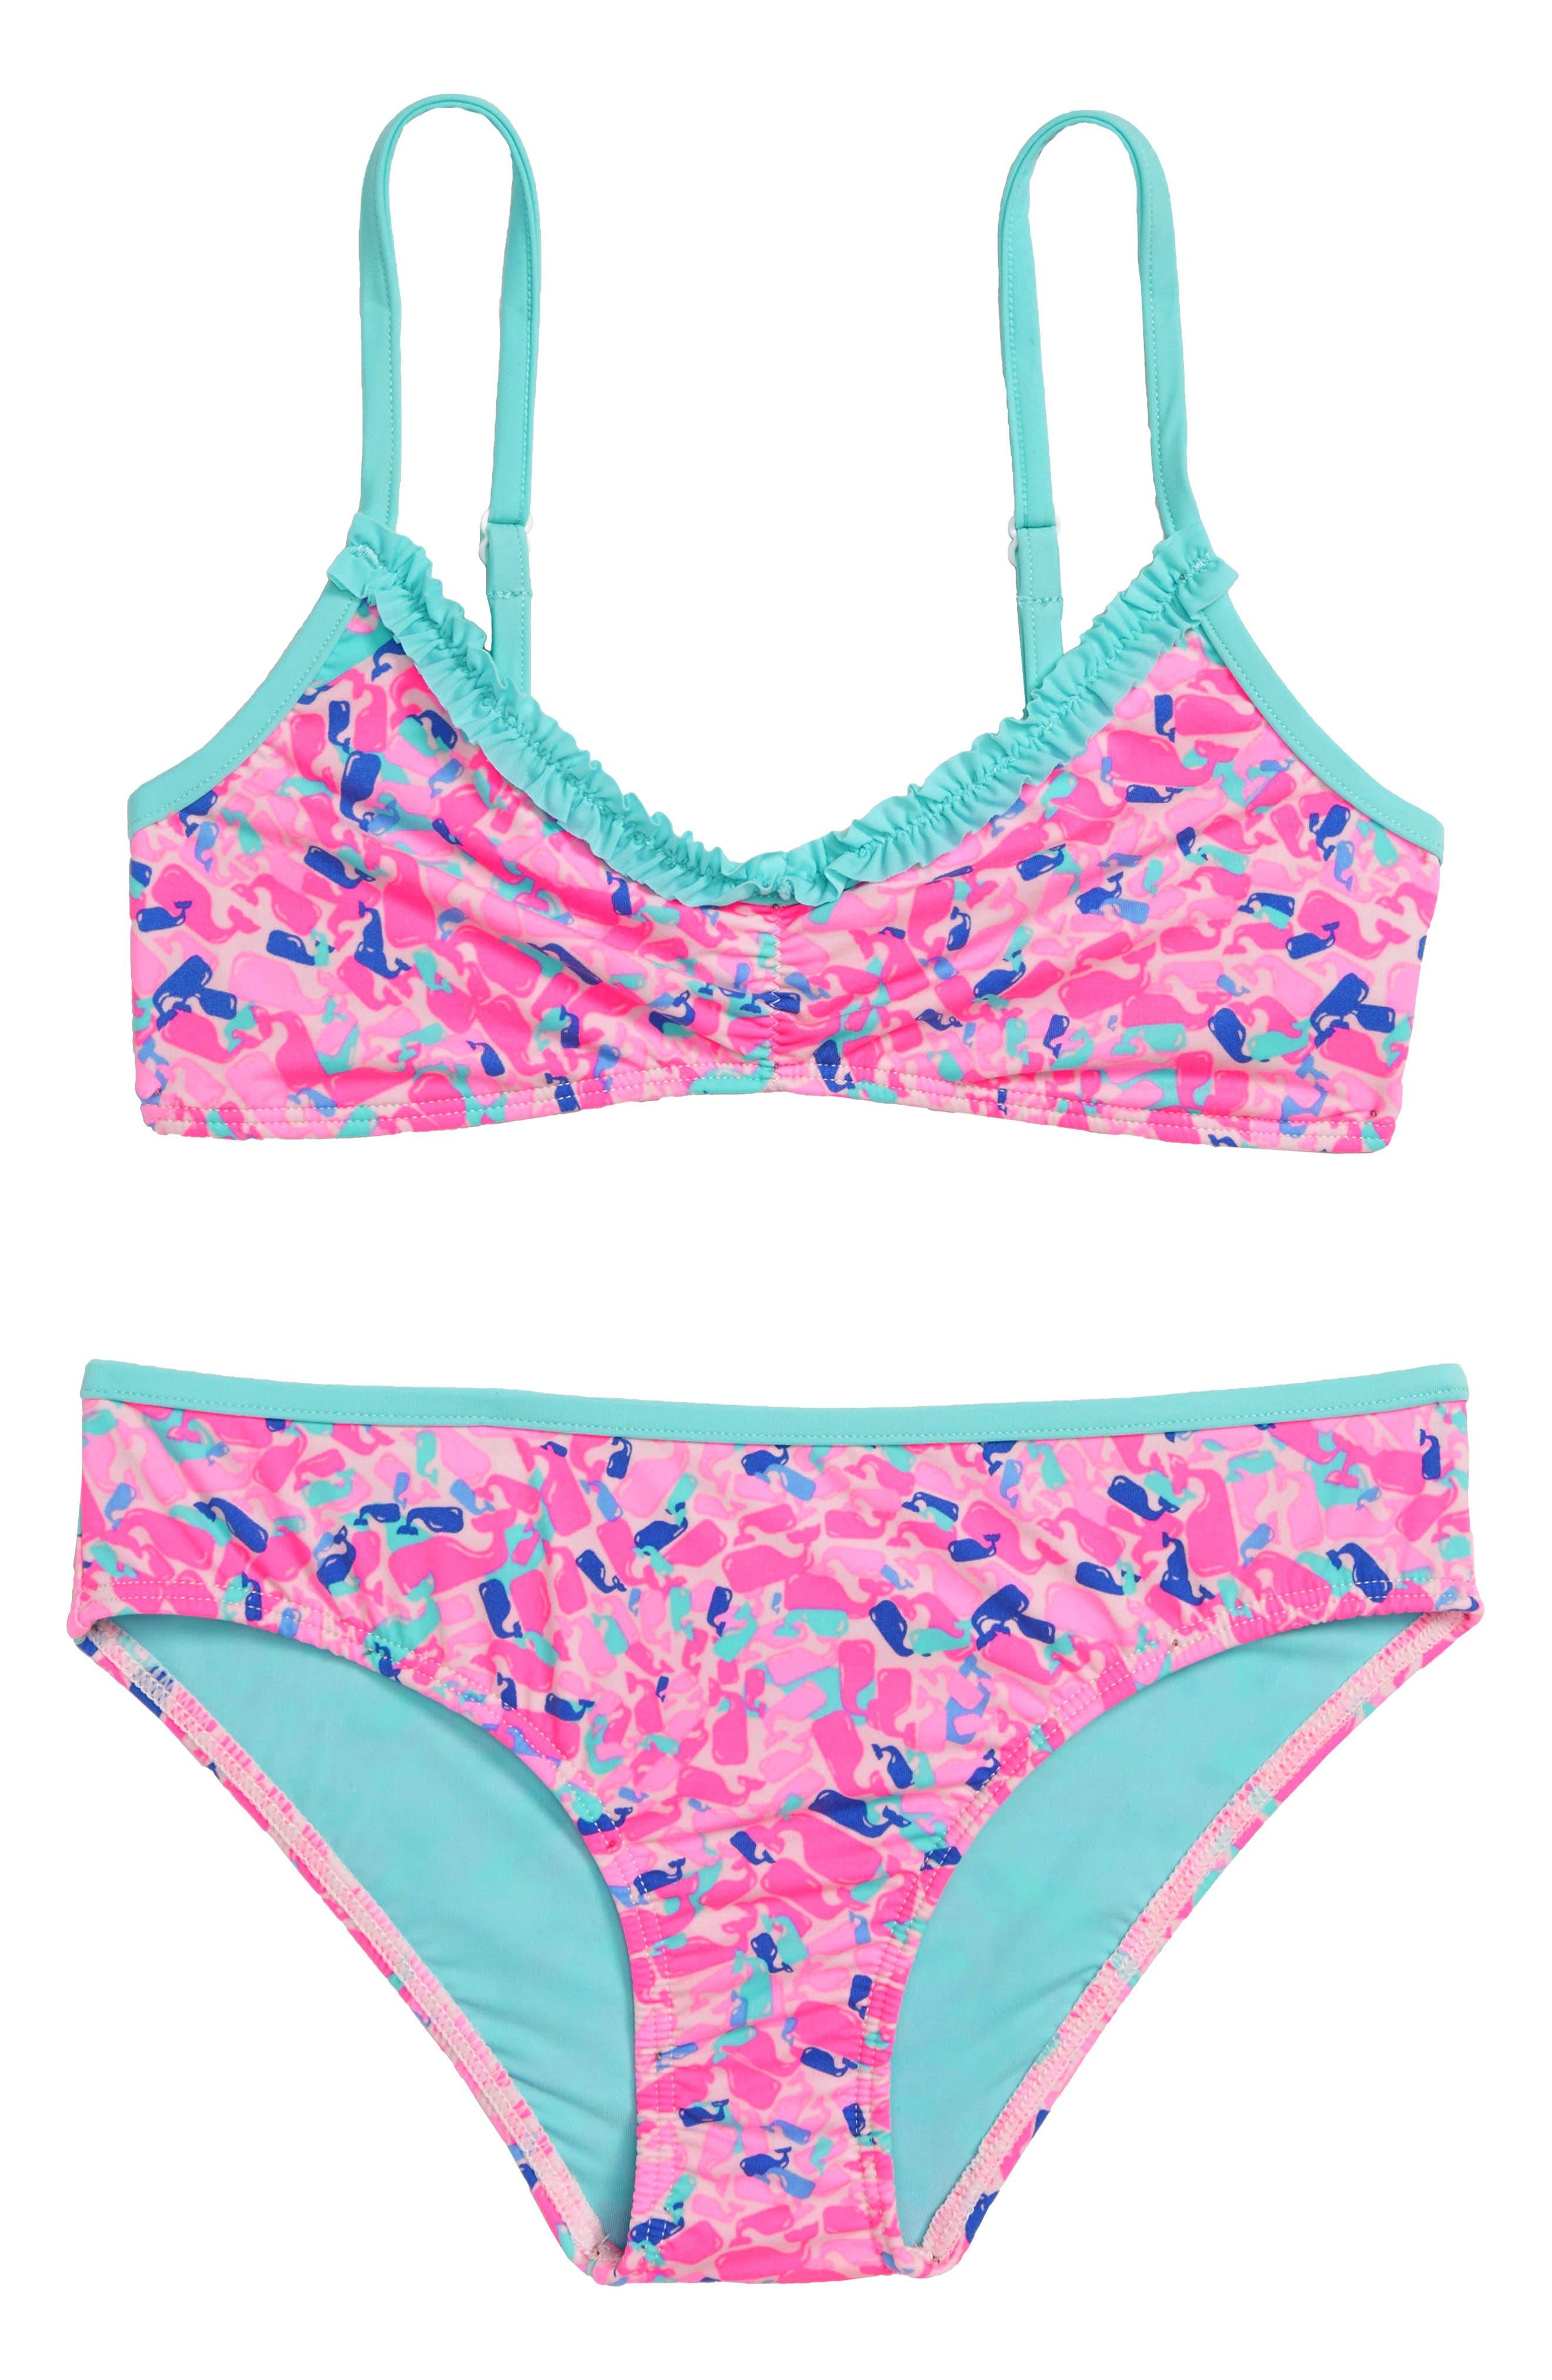 Whale Swirl Two-Piece Bikini Swimsuit,                         Main,                         color, 650